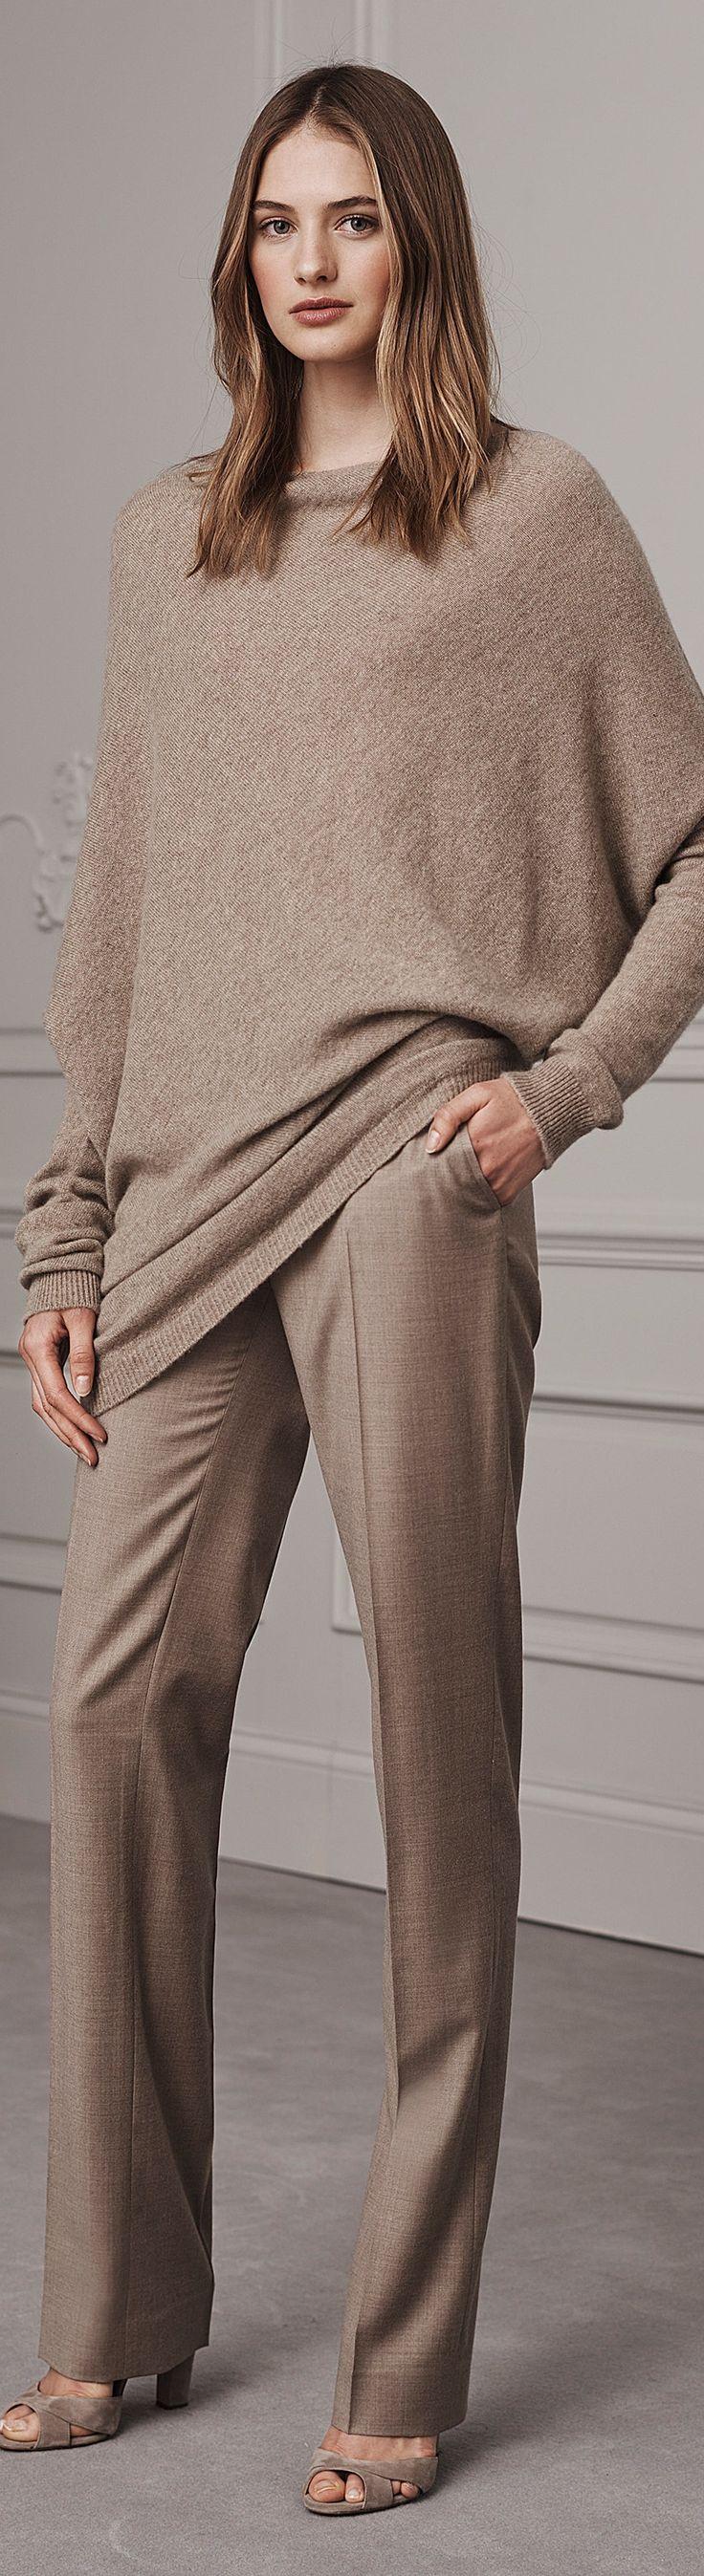 Ralph Lauren Pre Fall 2016 Fashion Show Ralph Lauren Trousers And Women 39 S Fashion